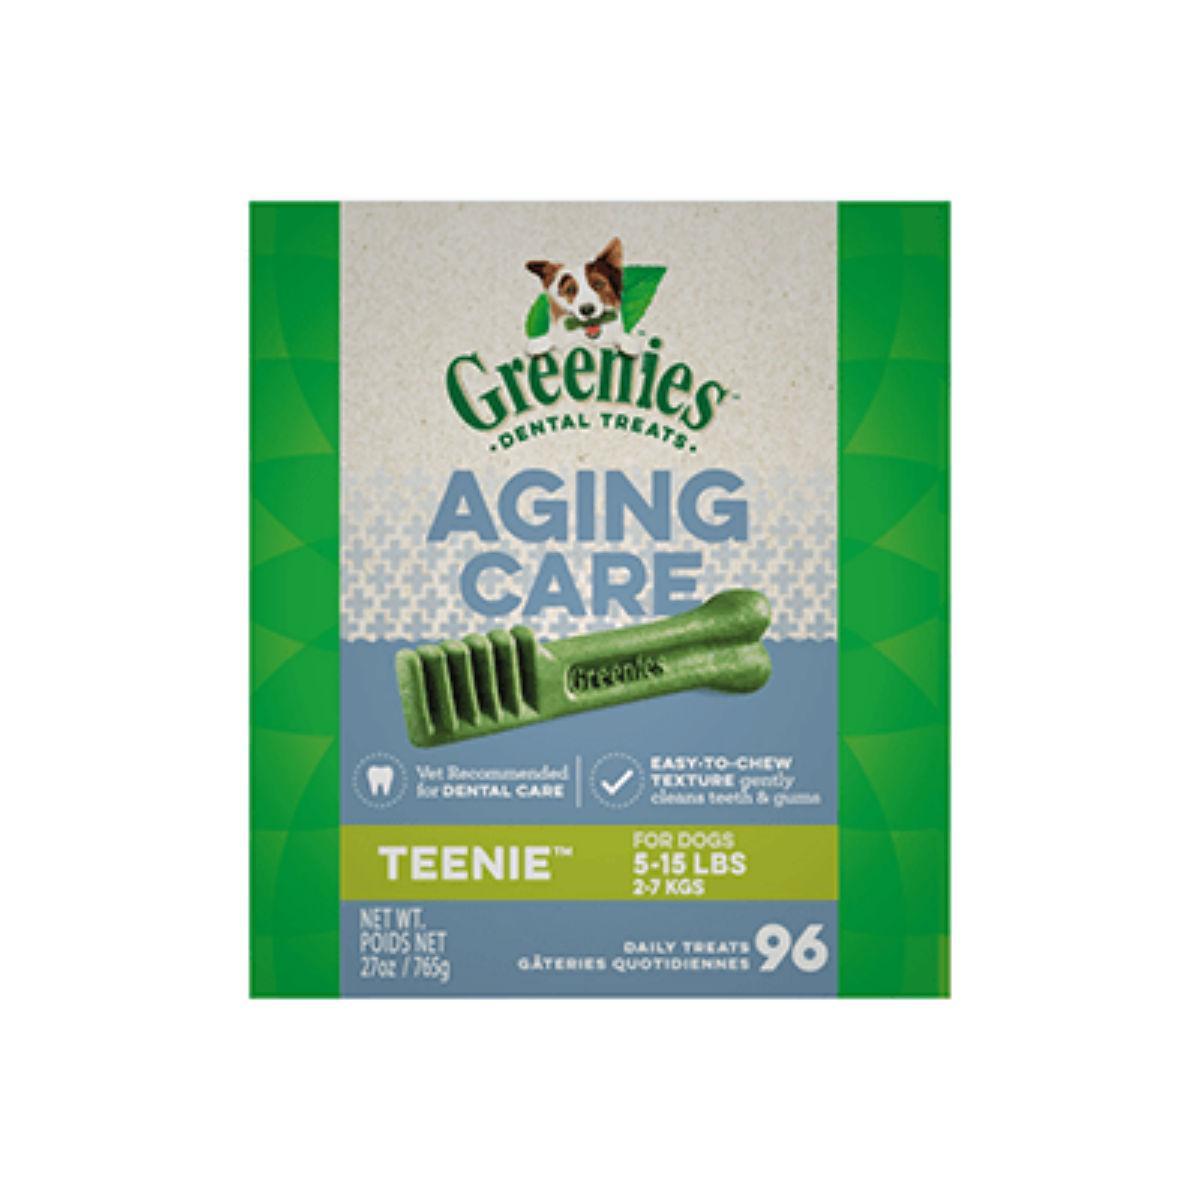 Greenies Dental Dog Chew - Aging Care